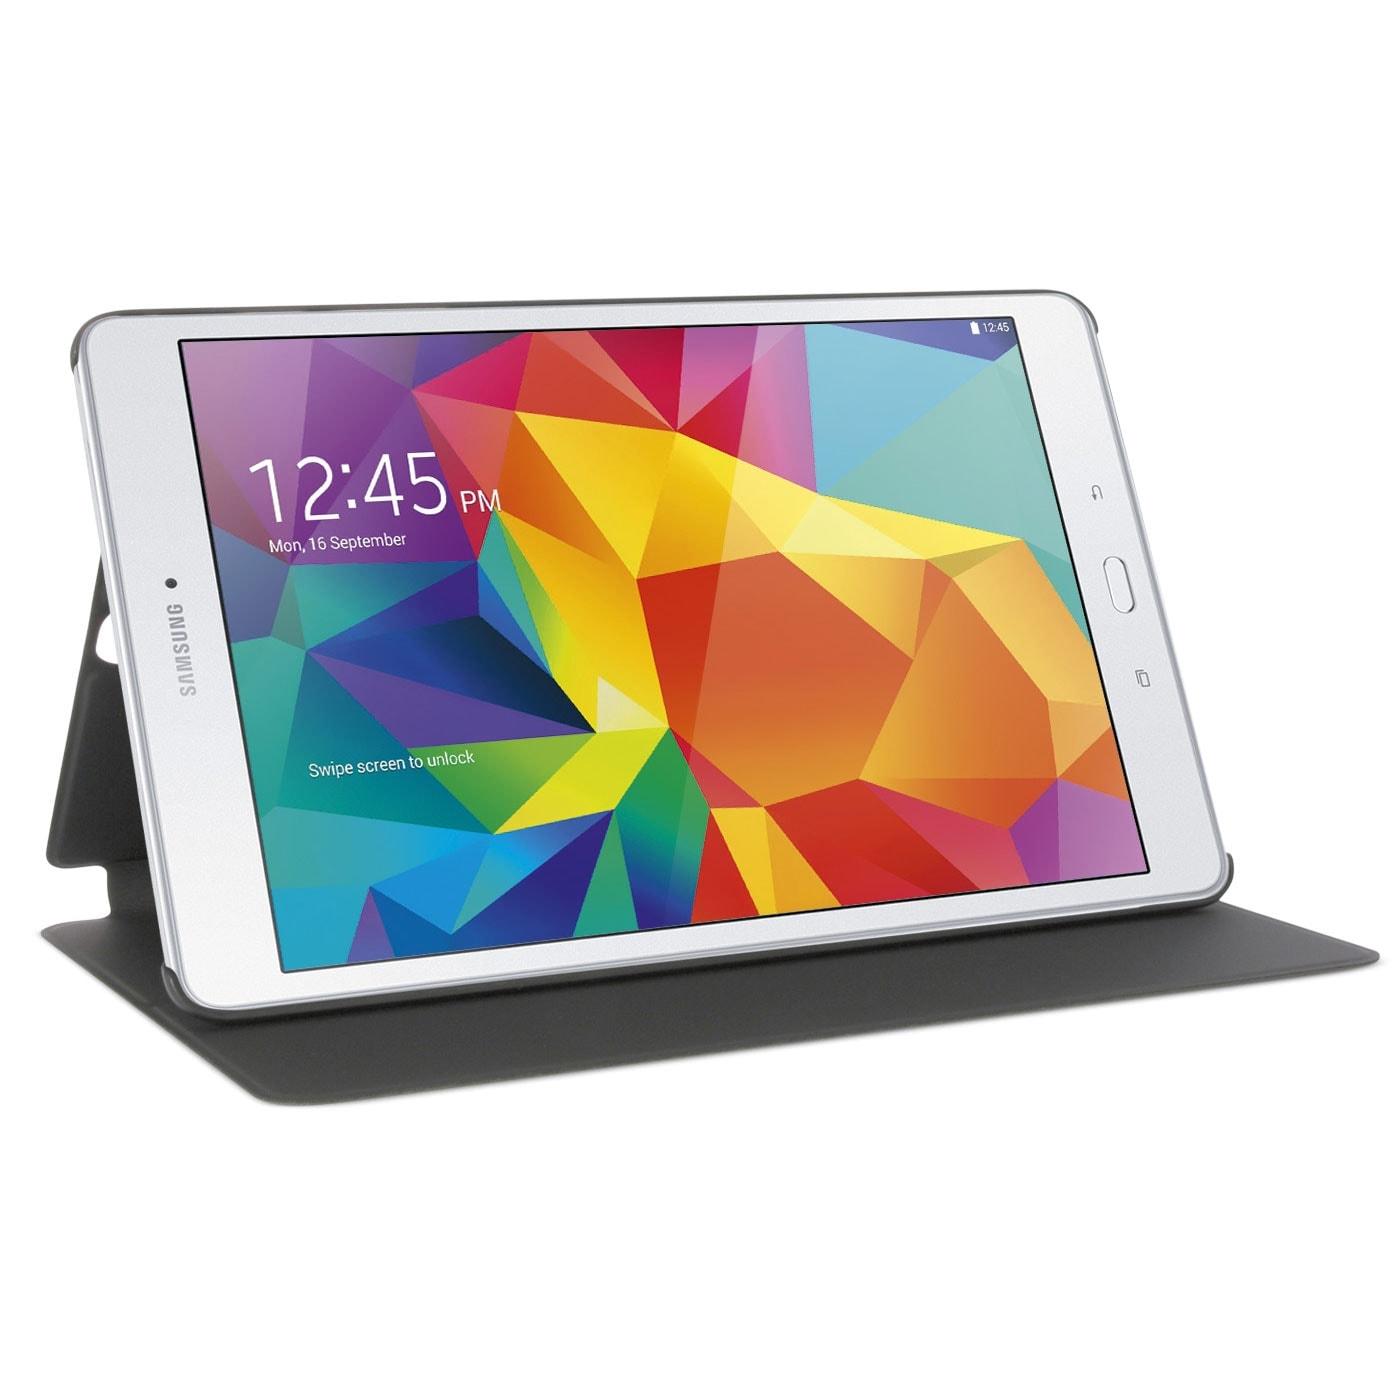 Etui Case C1 for Galaxy Tab A 7'' (T280) - Accessoire tablette - 0